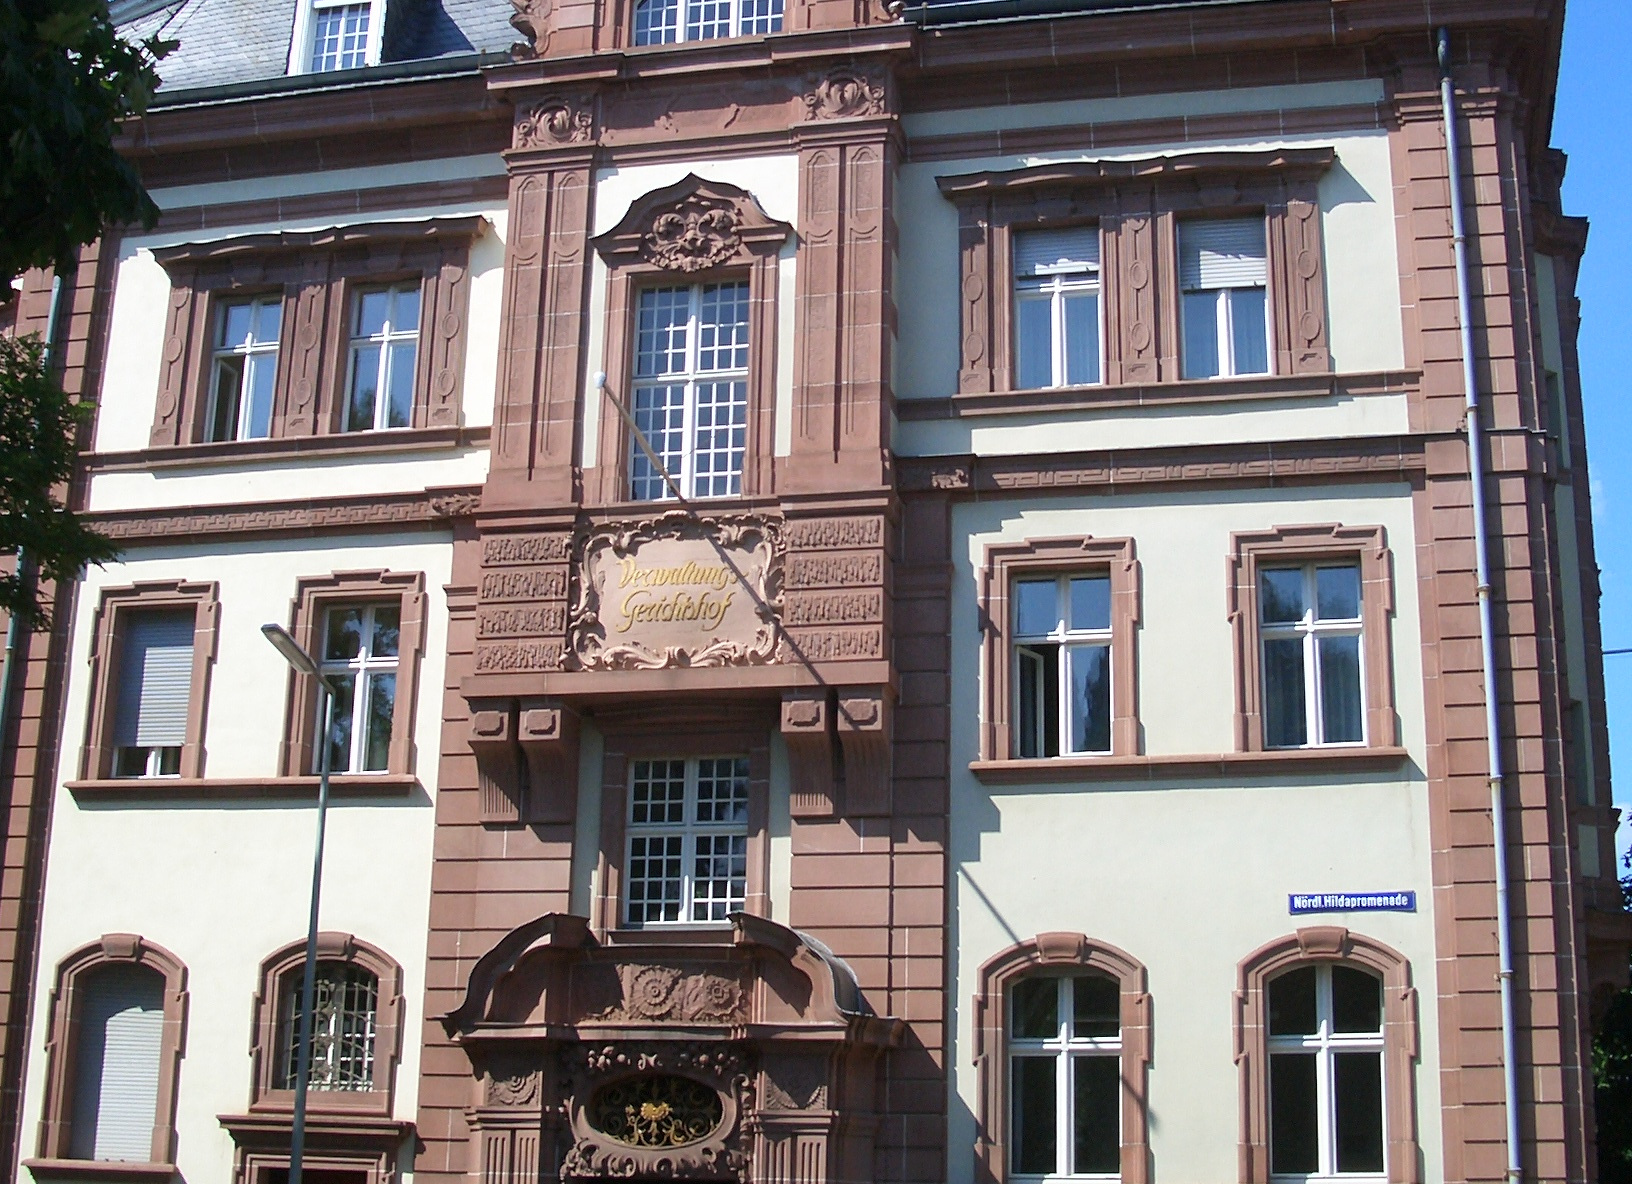 Das Verwaltungsgericht in Karlsruhe. Bild: Albtalkourtaki [GFDL or CC-BY-SA-3.0], from Wikimedia Commons